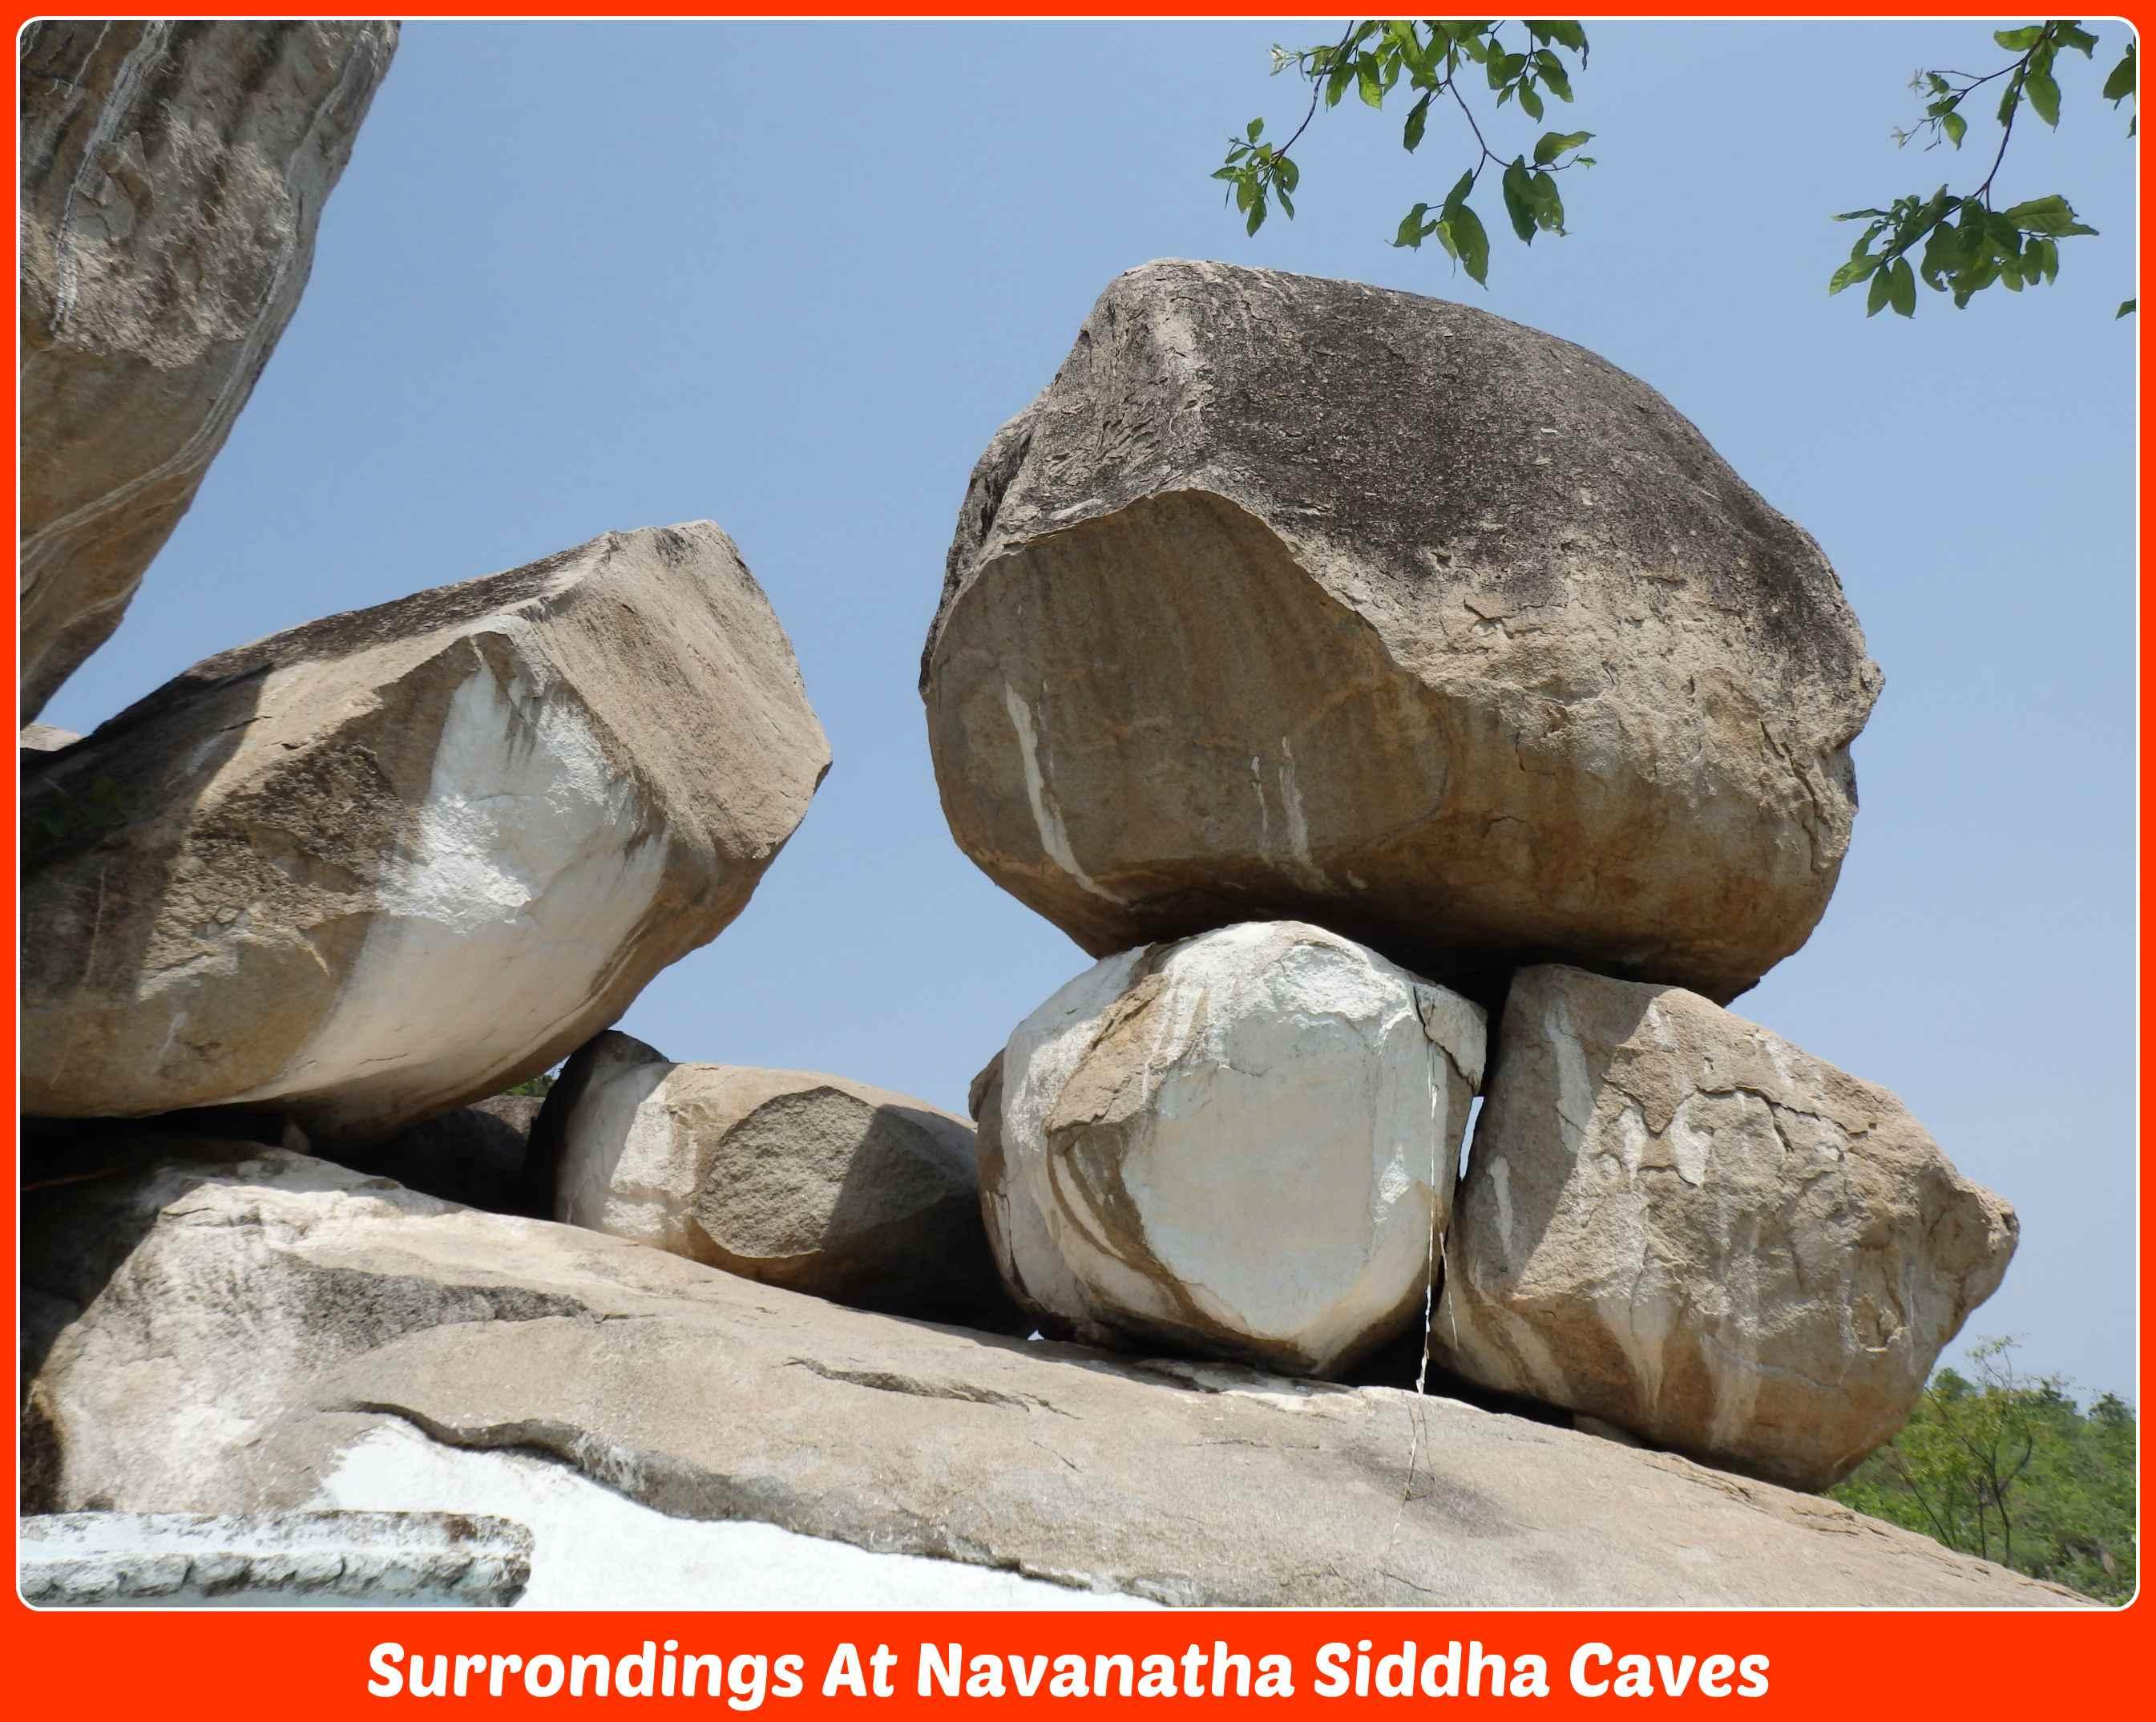 China Kodalgal (Pitlam) Navanatha Siddha Caves-17